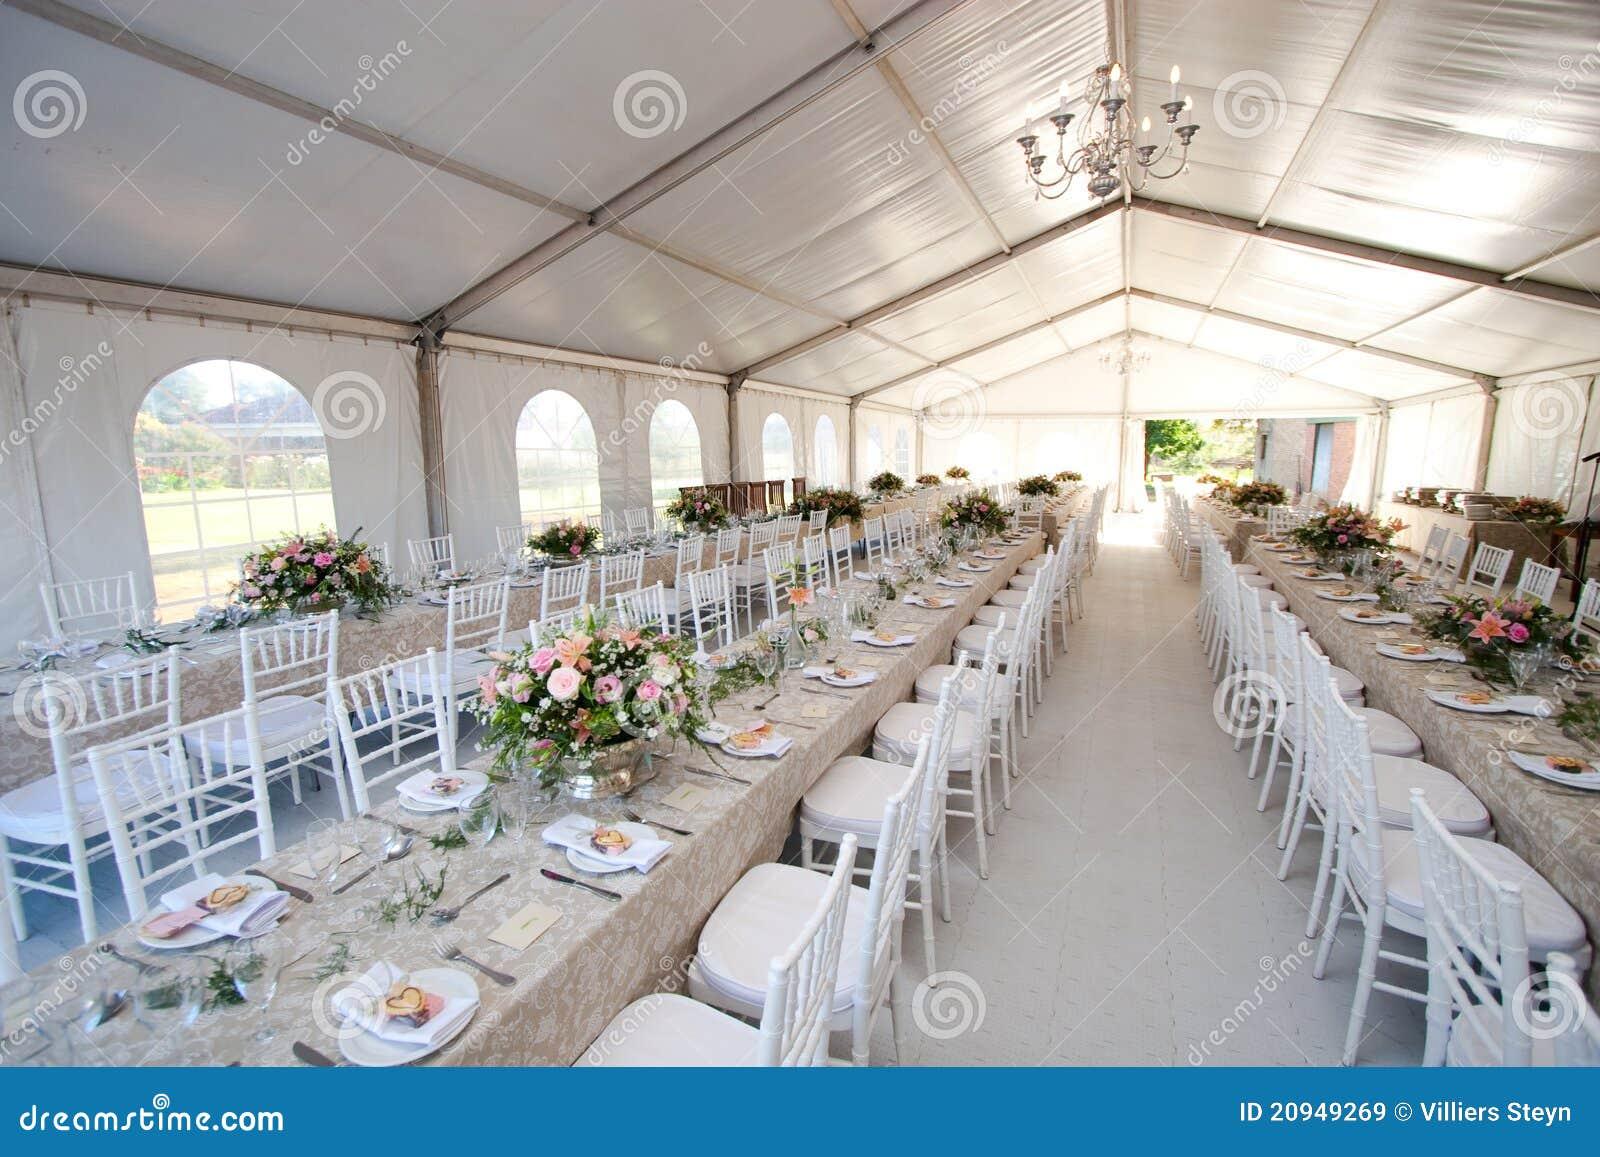 tente de mariage image stock image du blanc v nement 20949269. Black Bedroom Furniture Sets. Home Design Ideas